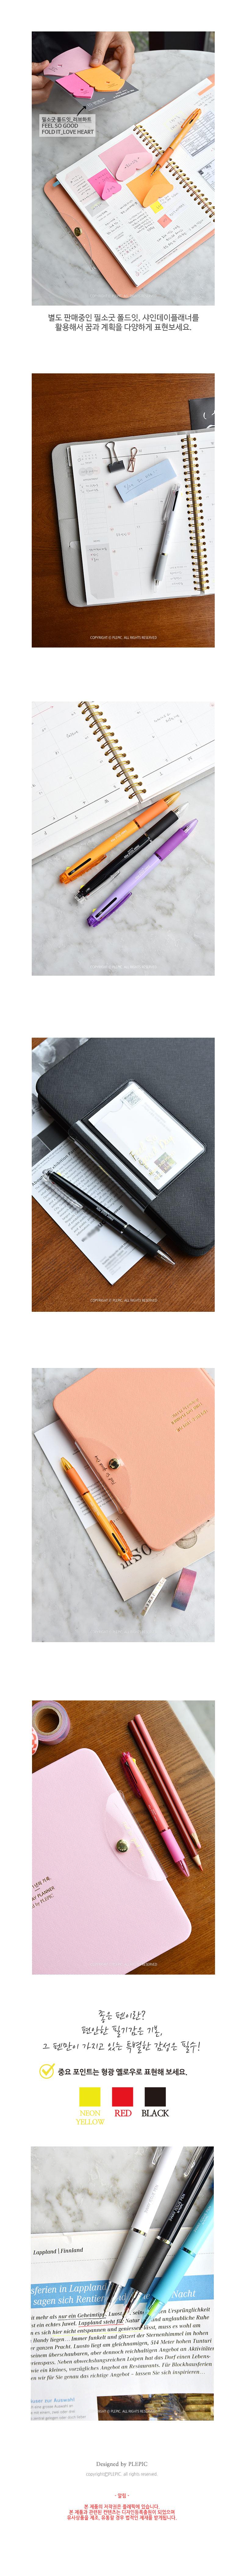 3way Issue Pen - 플레픽, 2,500원, 볼펜, 멀티색상 볼펜